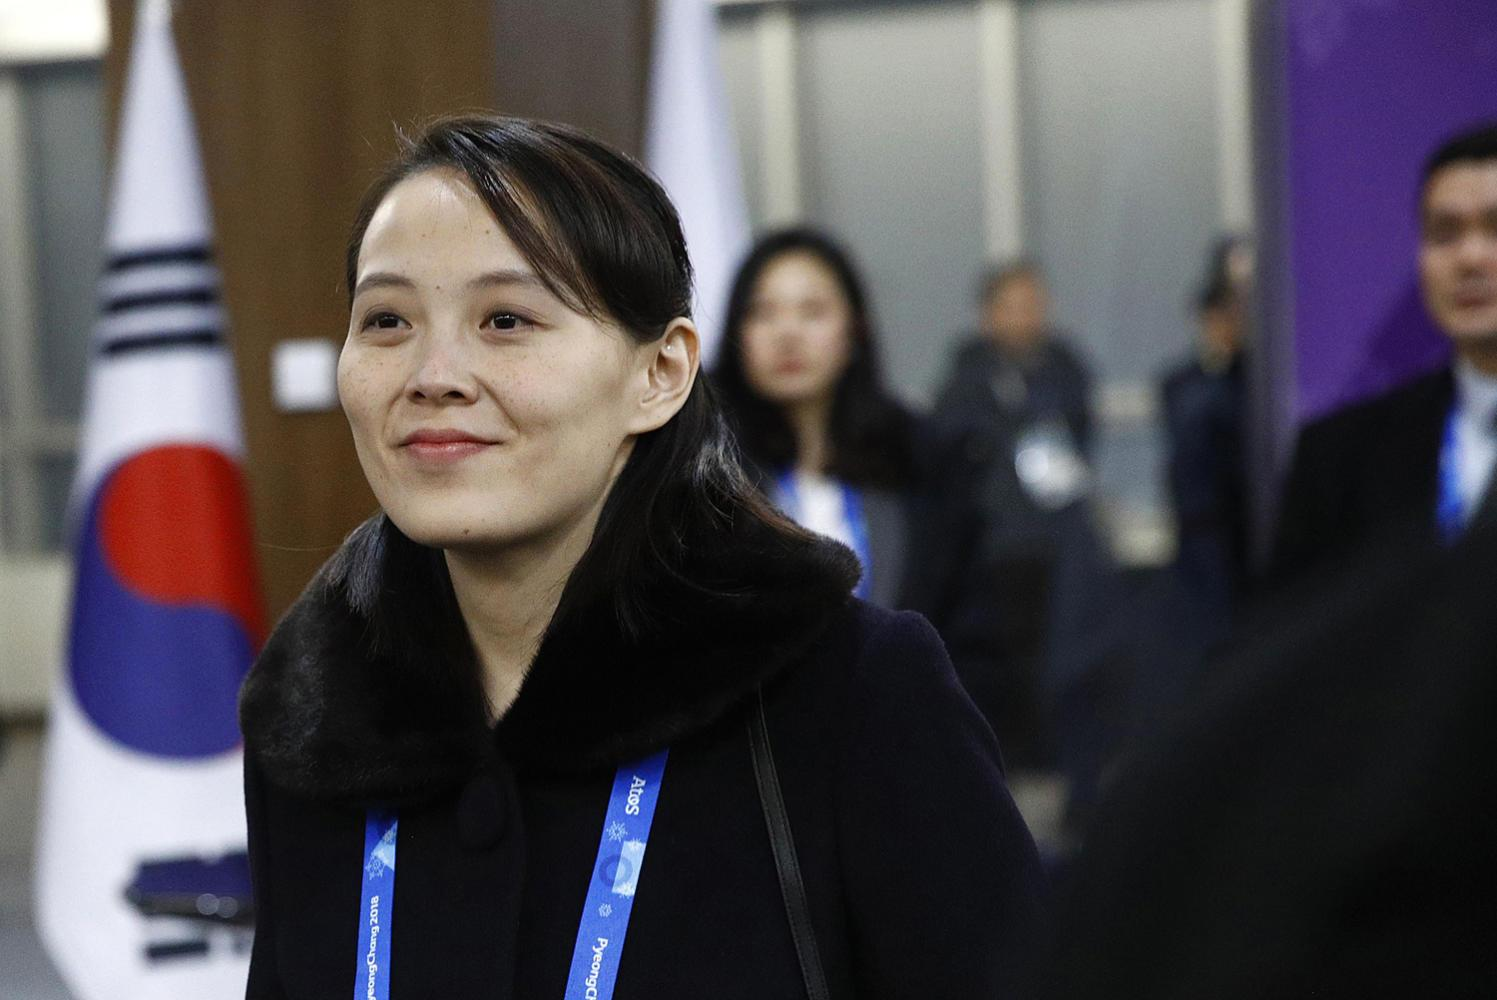 Kim Yo Jong, sister of North Korean leader Kim Jong Un, arrives at the opening ceremony of the 2018 Winter Olympics on Friday in Pyeongchang, South Korea. (Patrick Semansky/Prensa Internacional/Zuma Press/TNS)